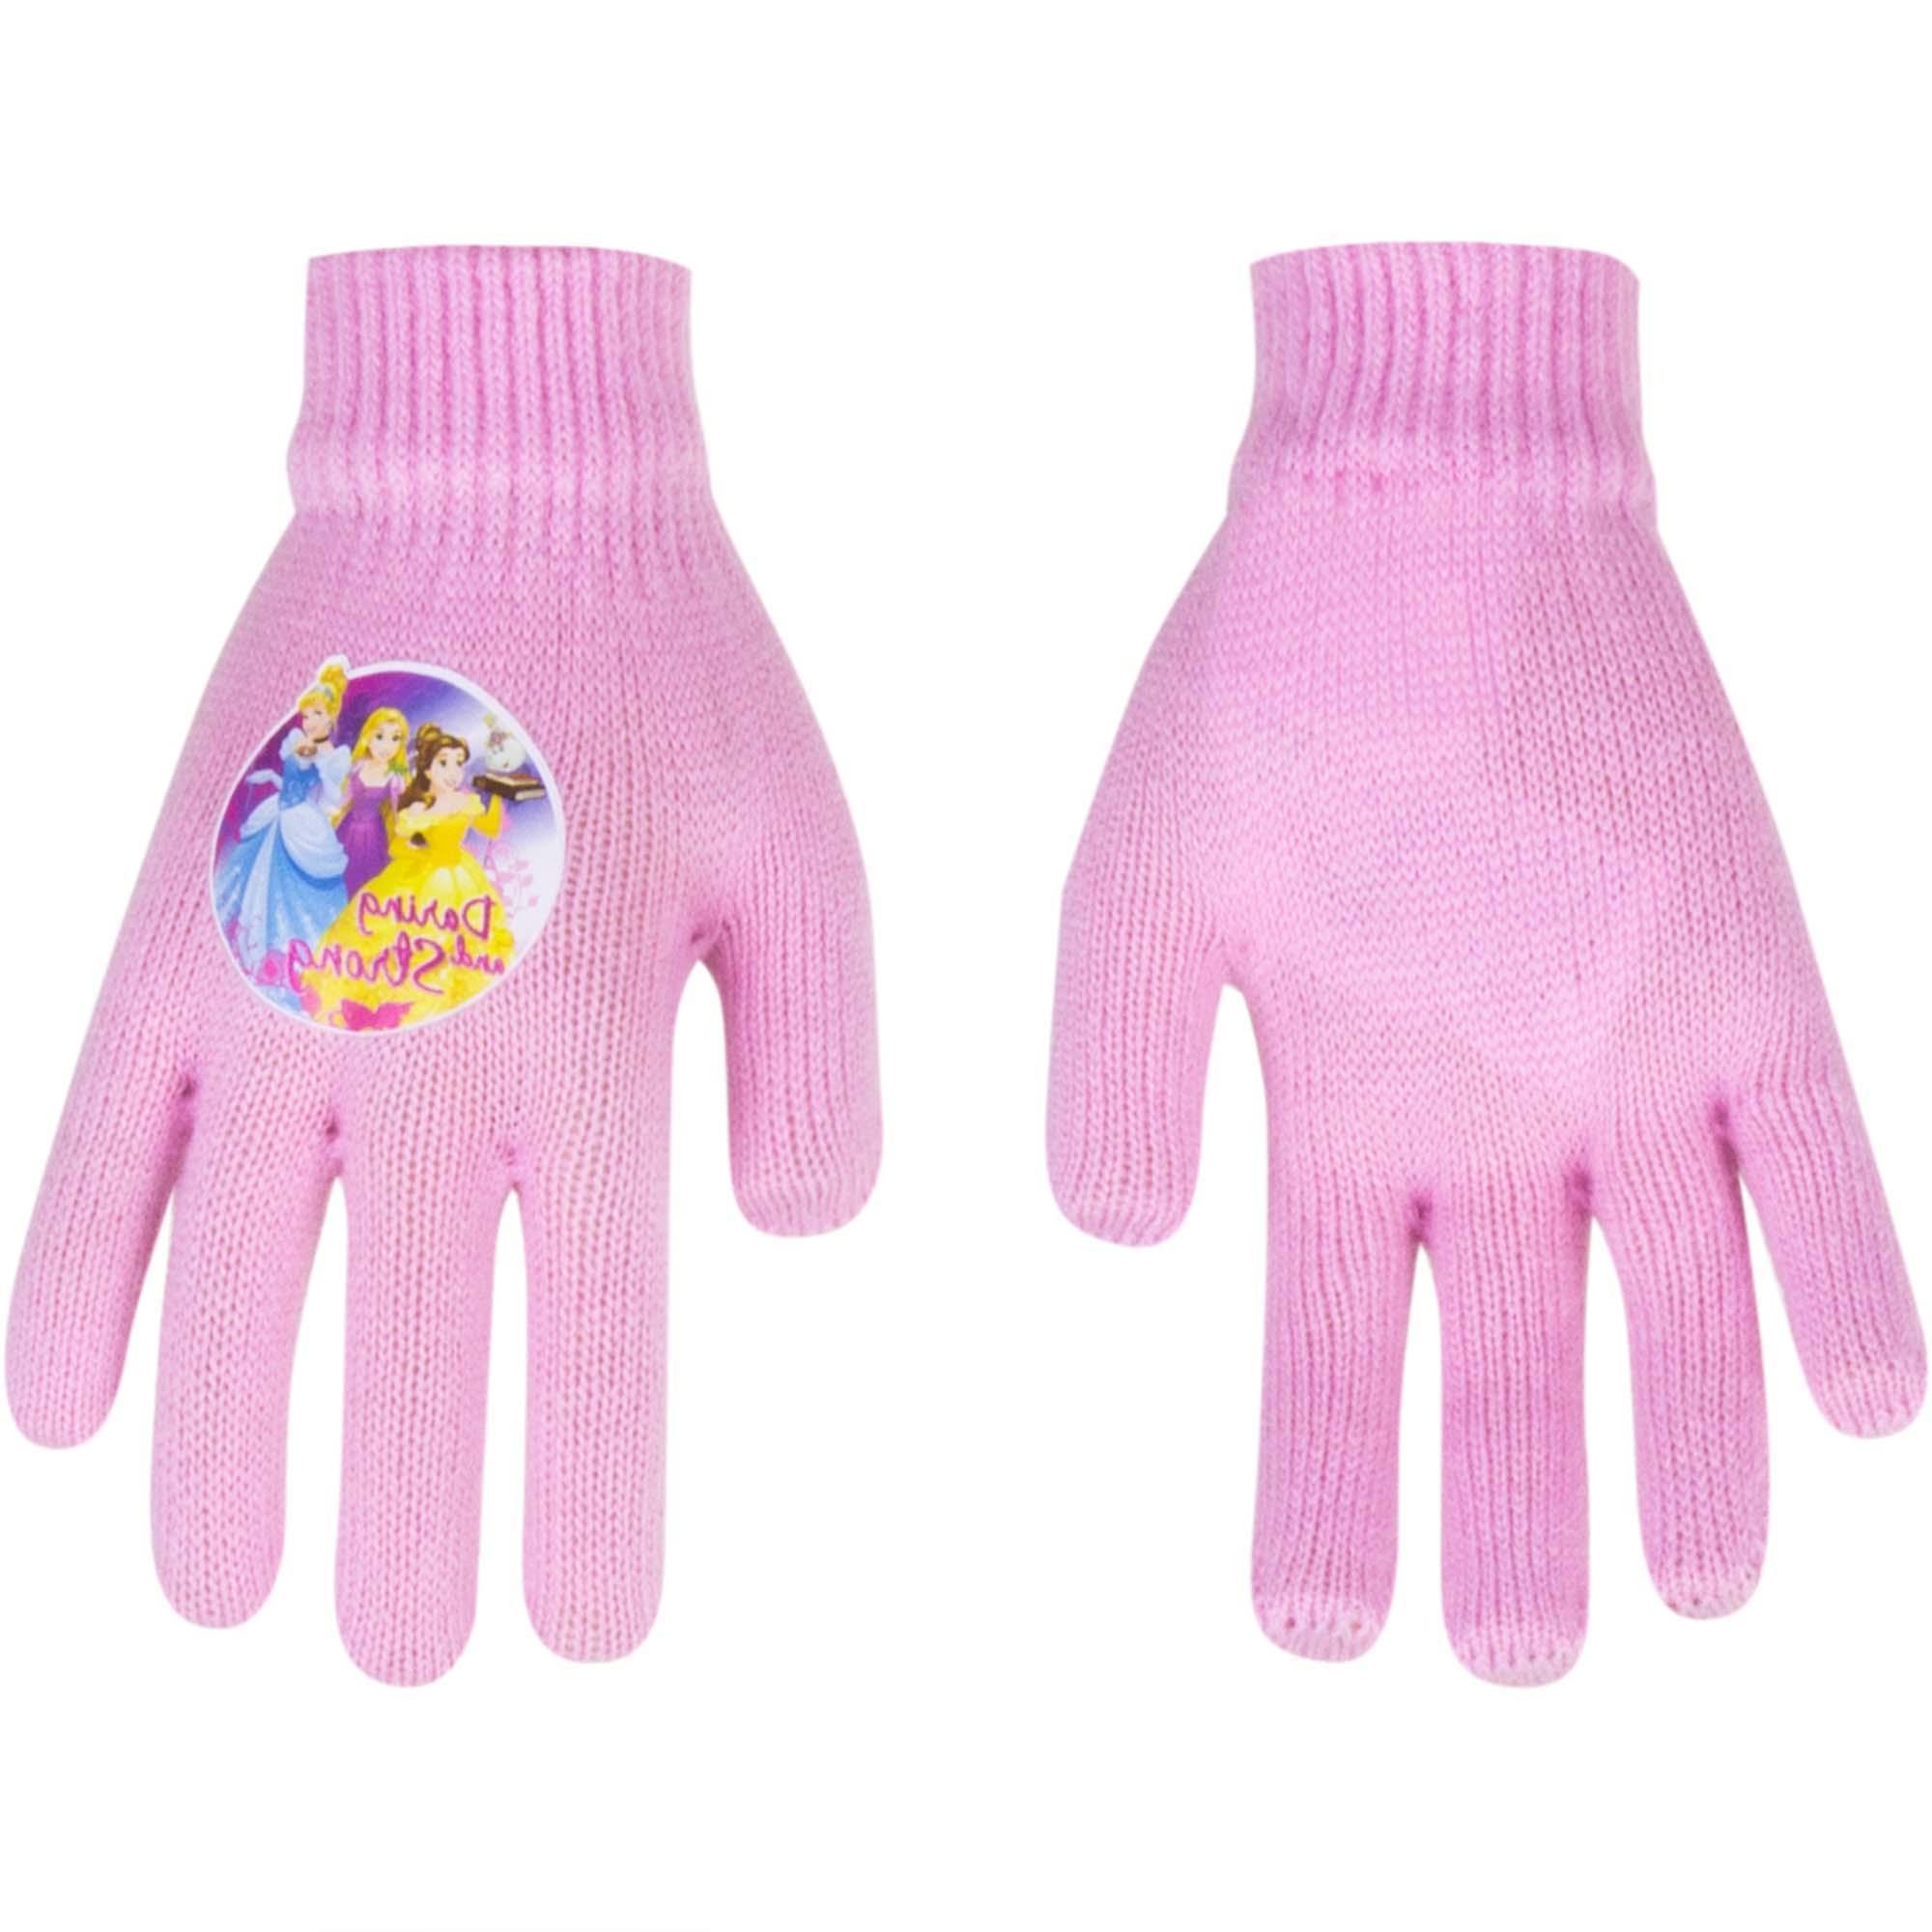 Princess gloves Magic (Age: 2-5 years old)